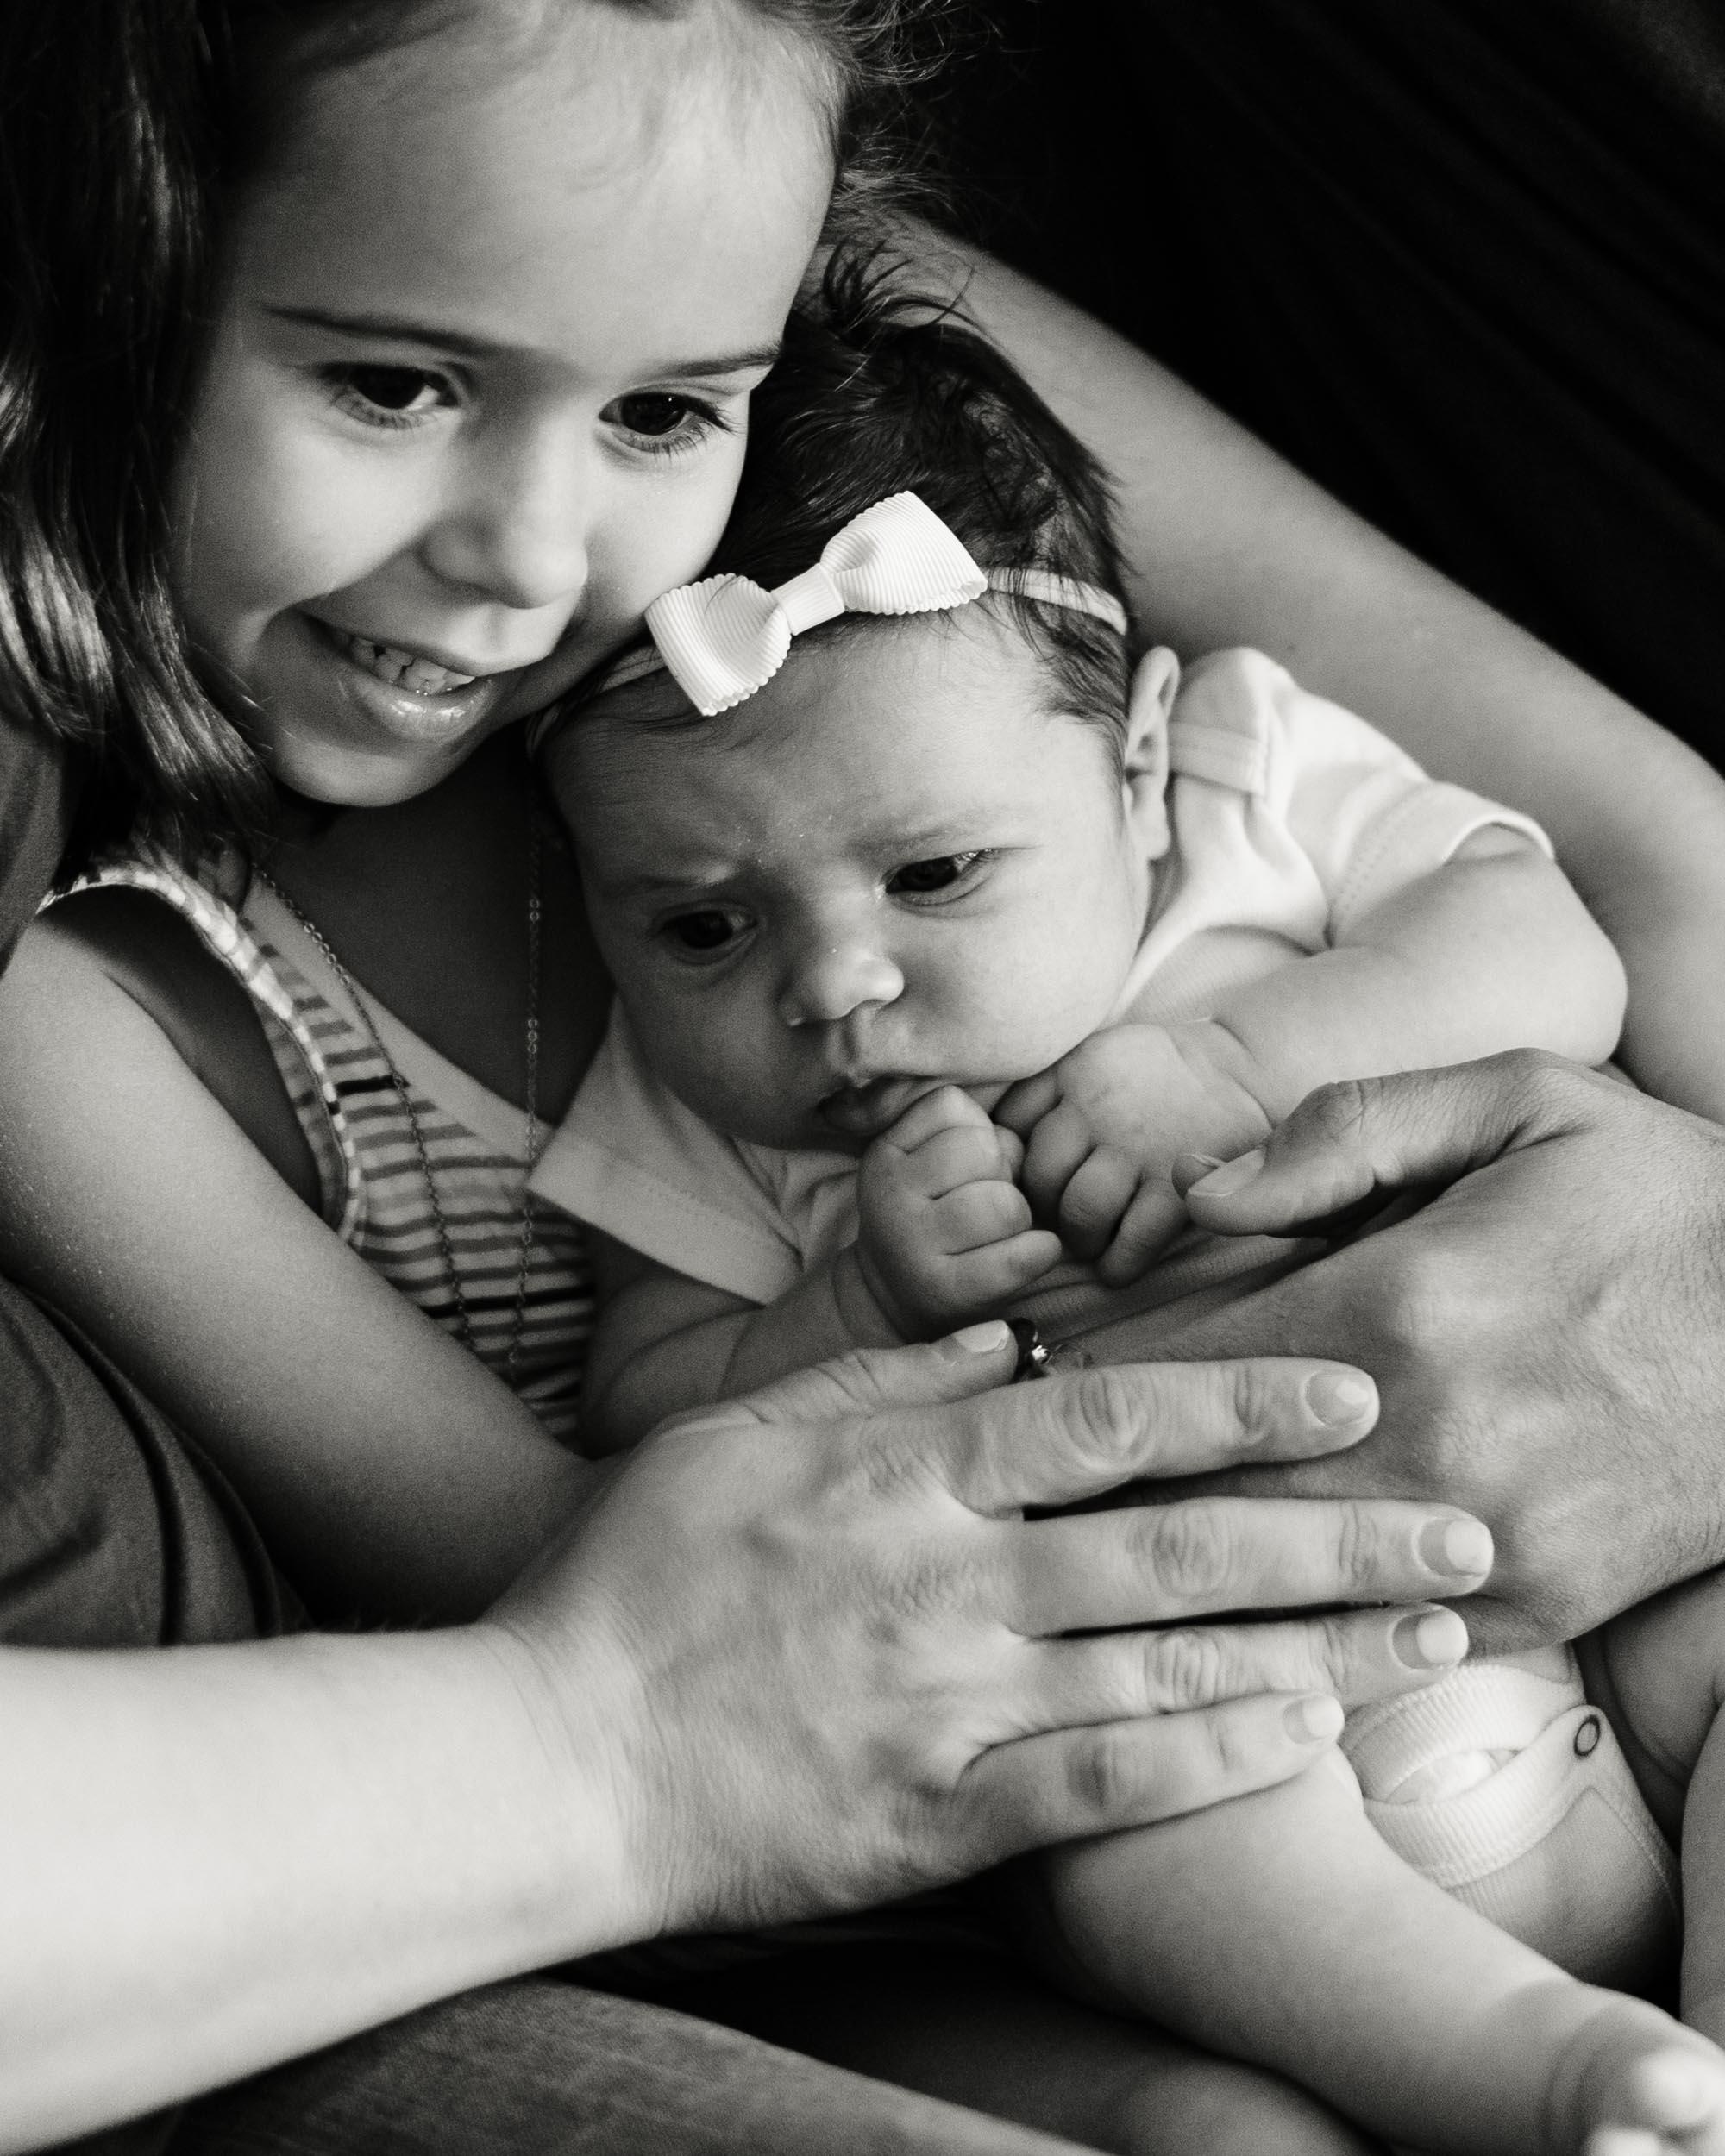 holding her newborn sister